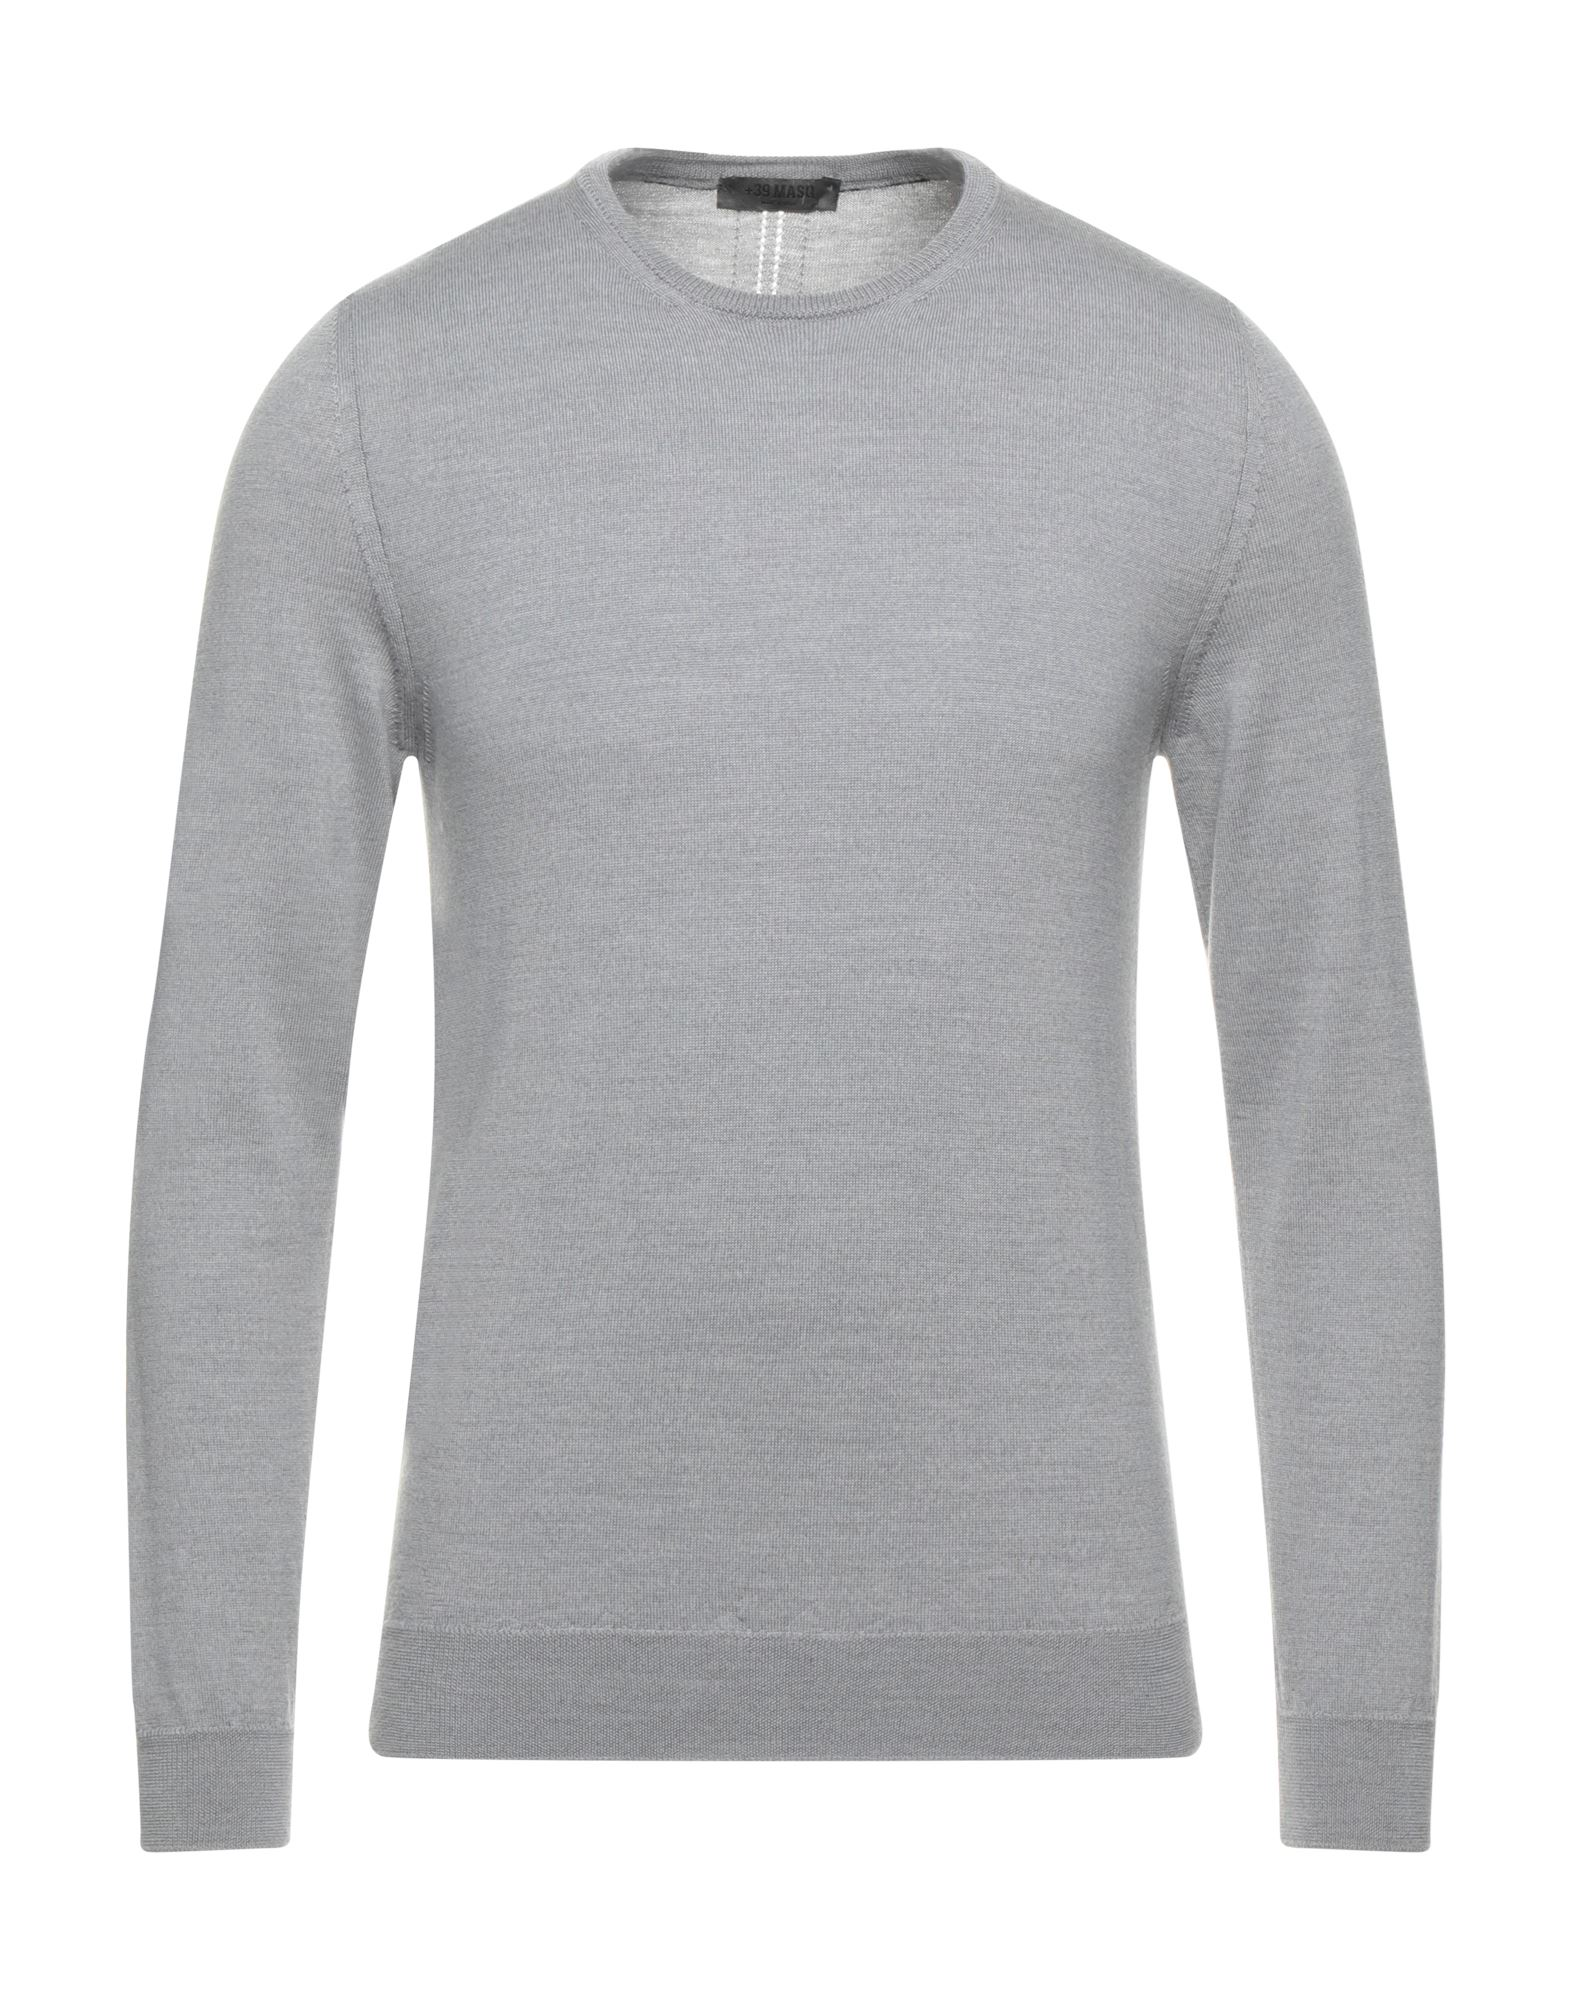 +39 MASQ Sweaters - Item 39955230